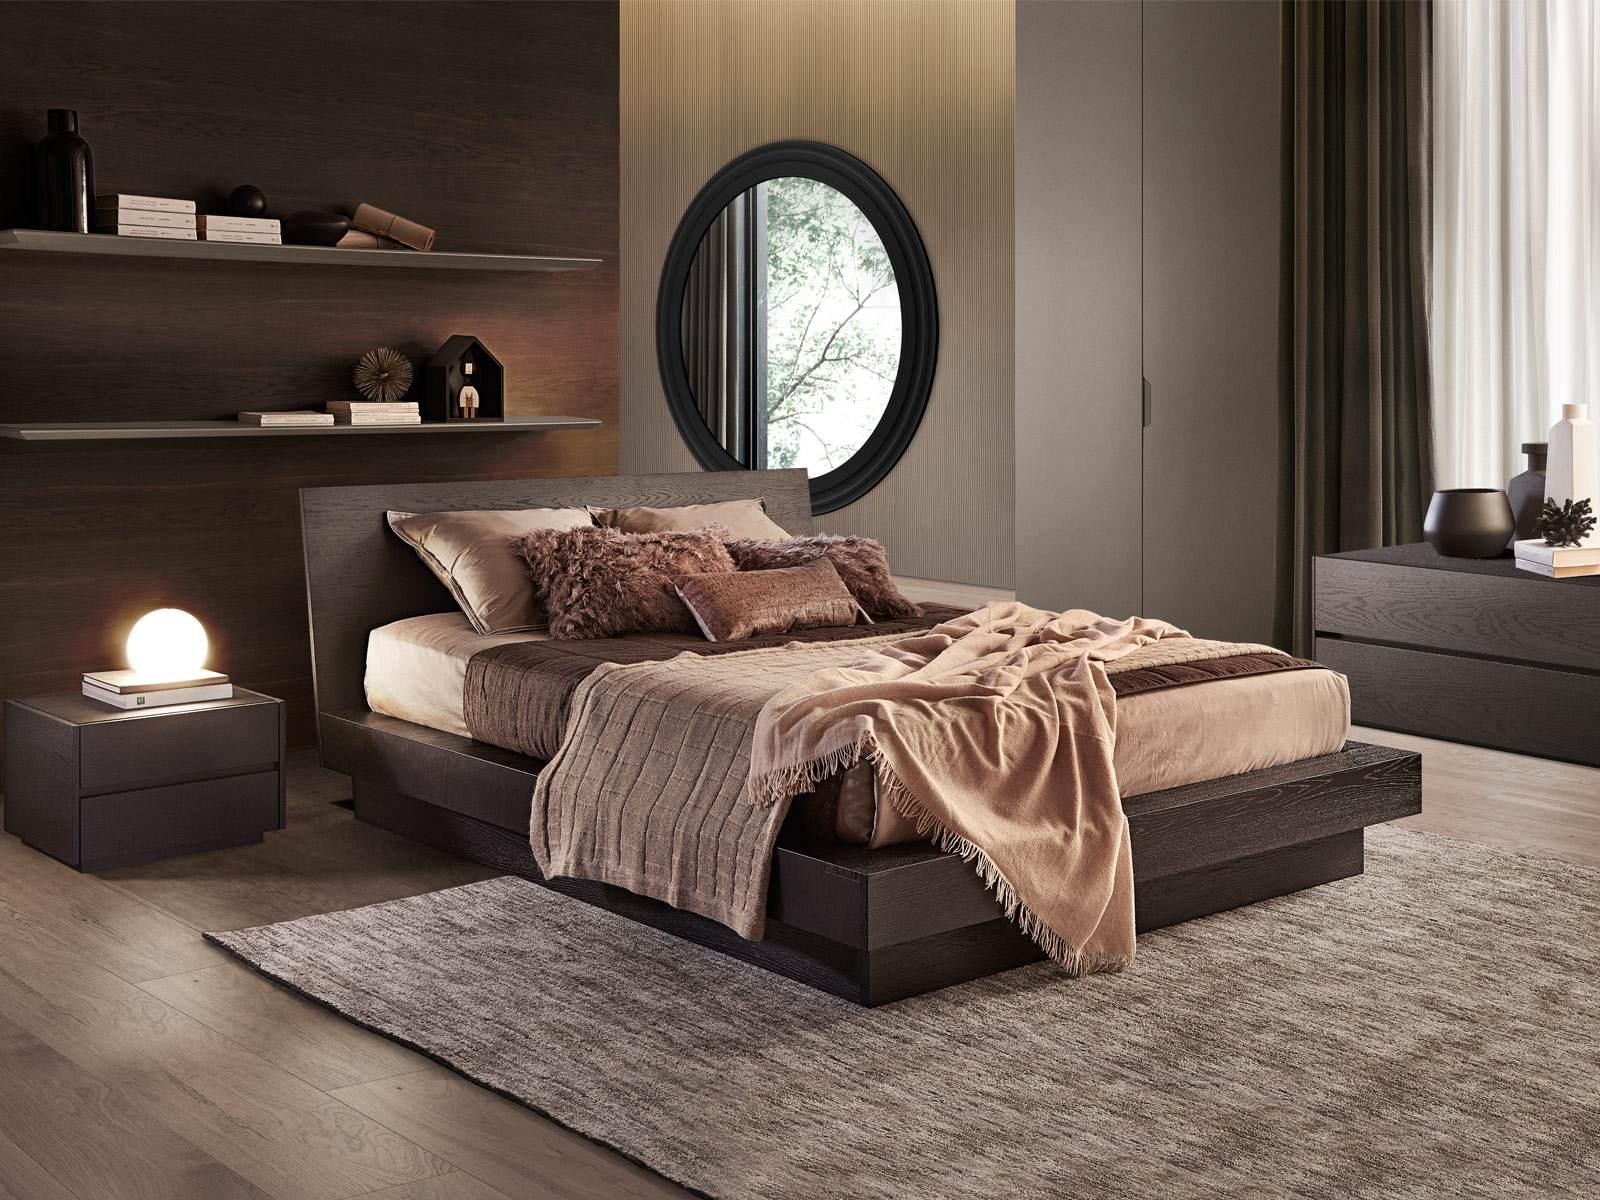 Contemporary Beds Stunning Italian Designer Beds Designs